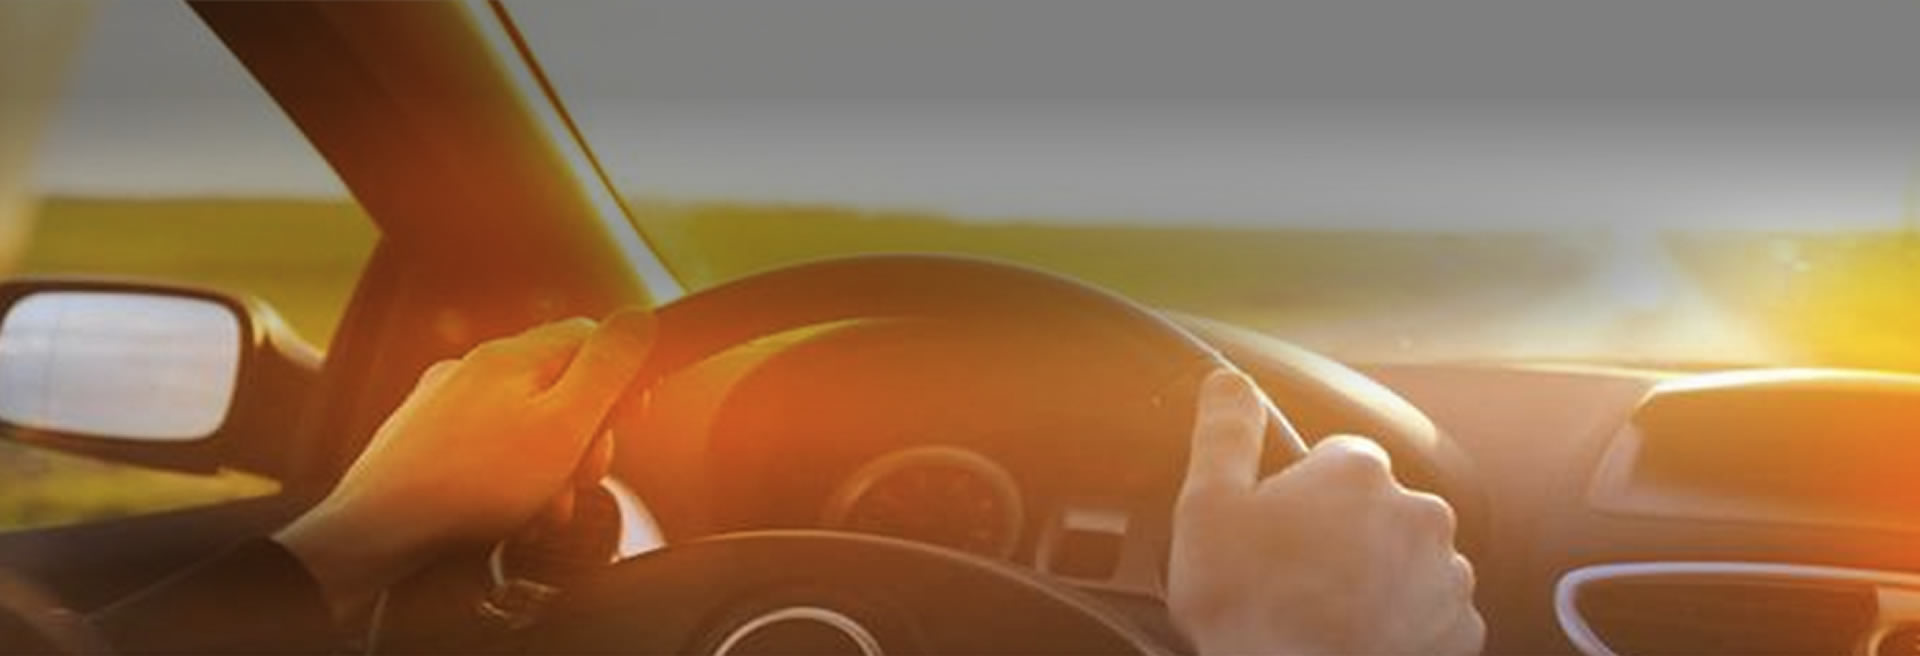 Alquiler De Autos Baratos Alquiler De Vehiculos Interturis